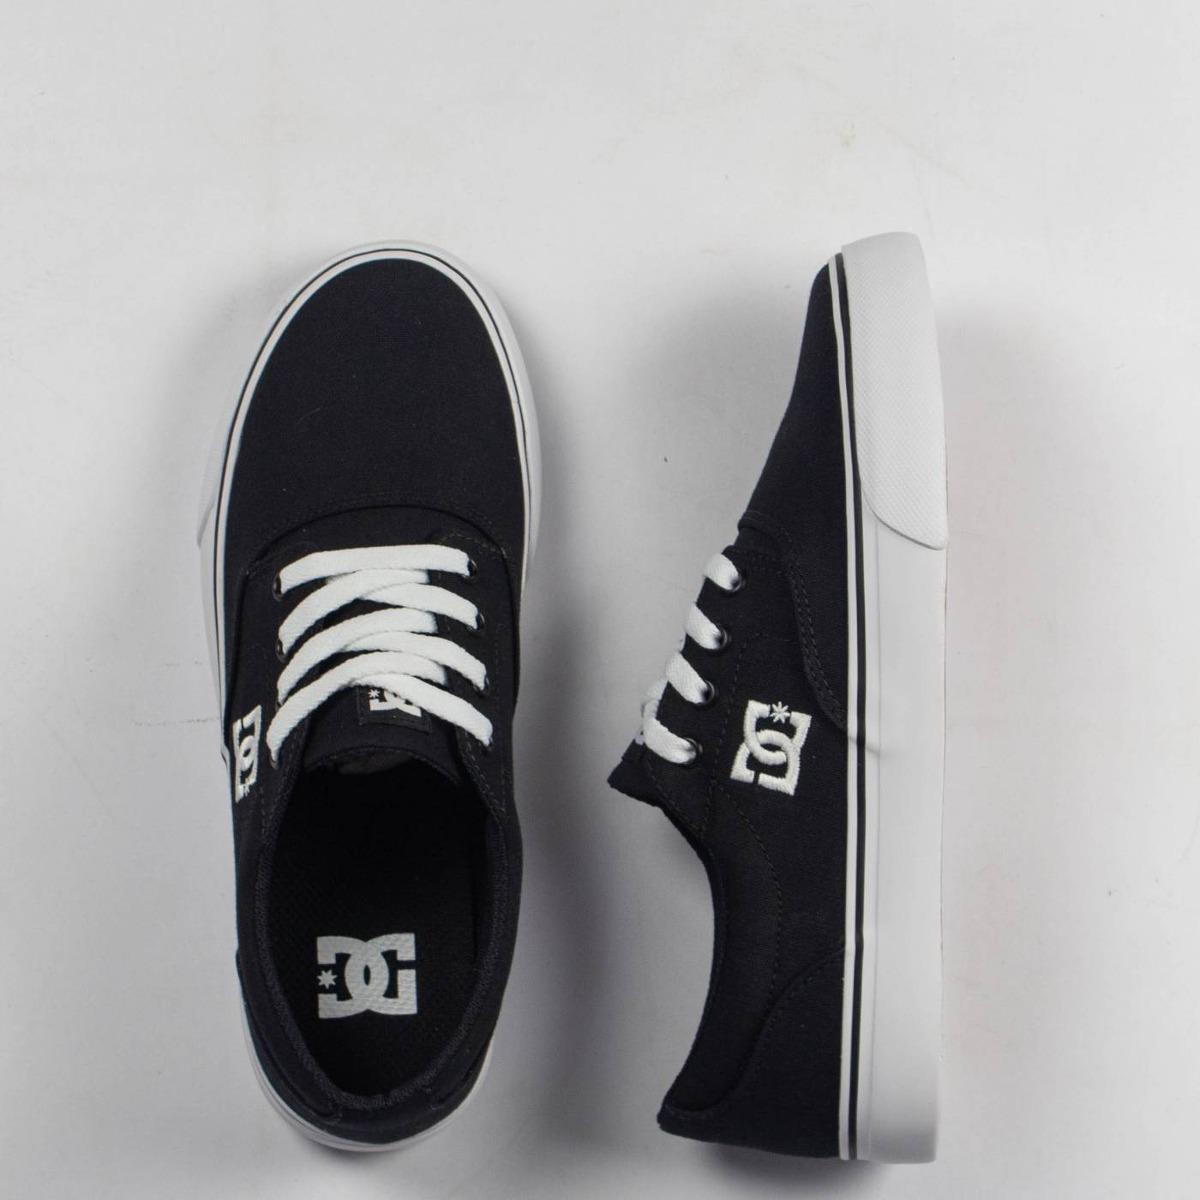 2c594925a3 tênis masculino dc shoes new flash 2 tx black white original. Carregando  zoom.